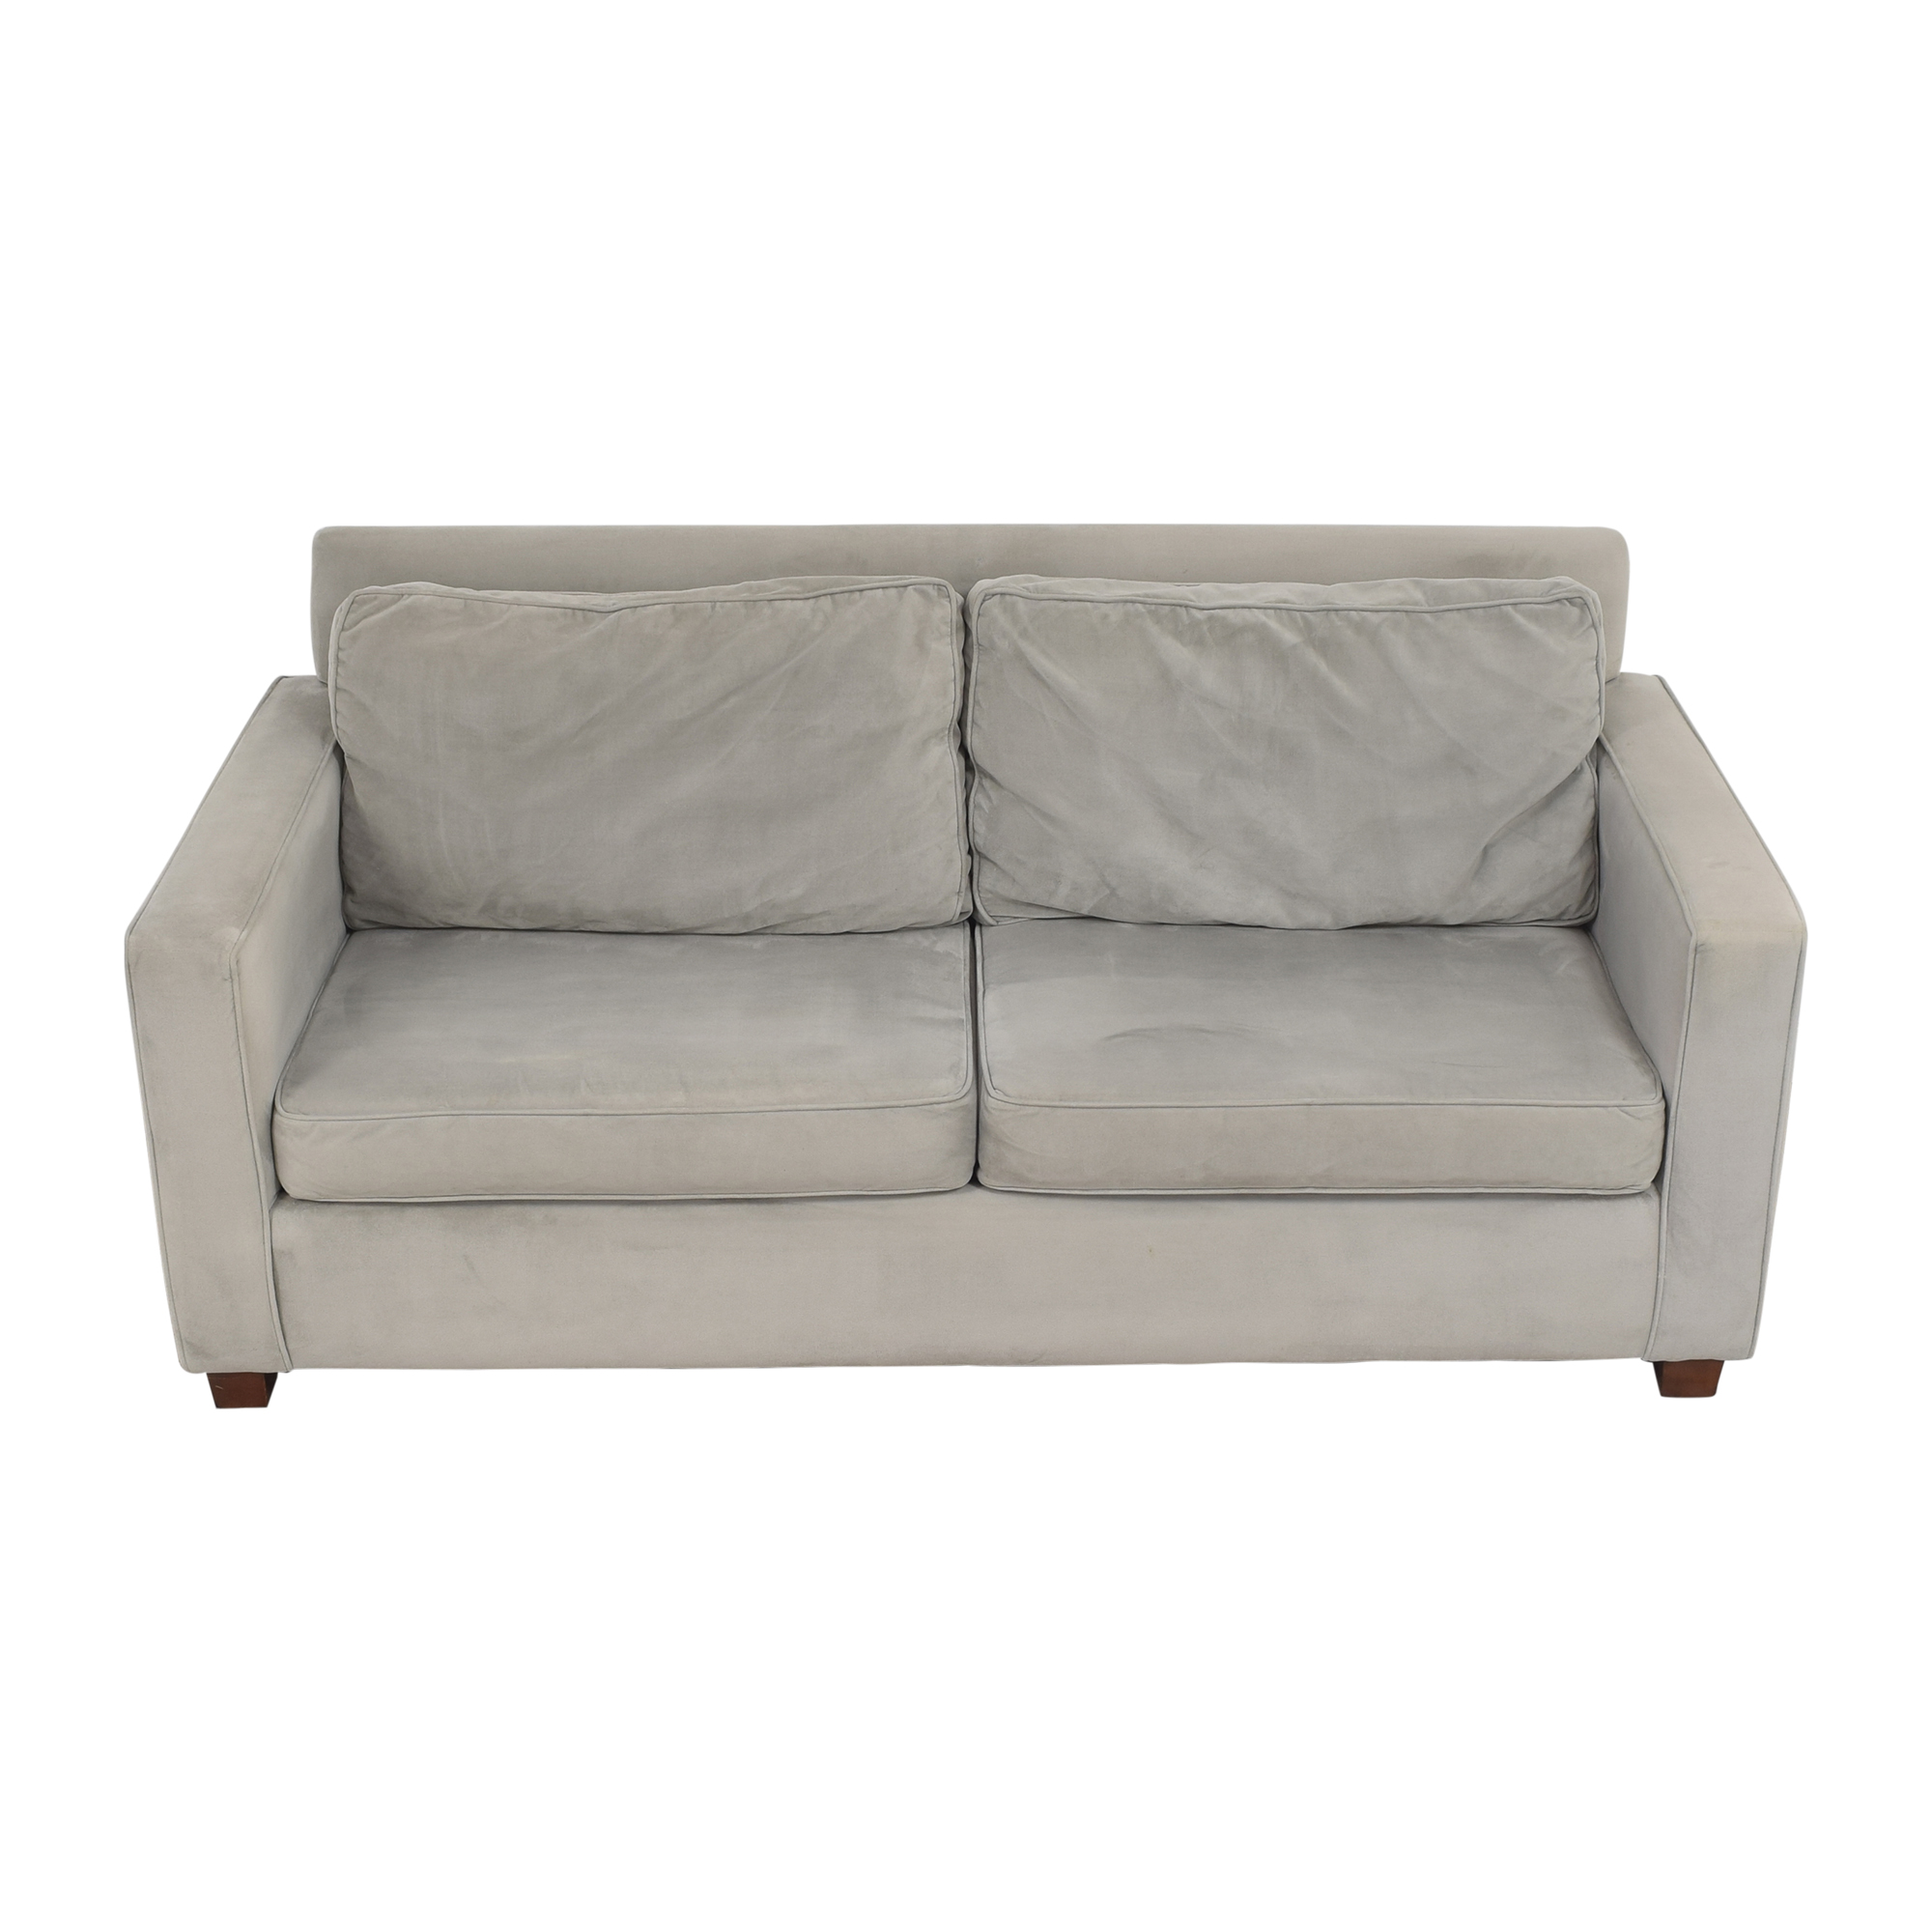 buy West Elm West Elm Henry Two Cushion Sofa online